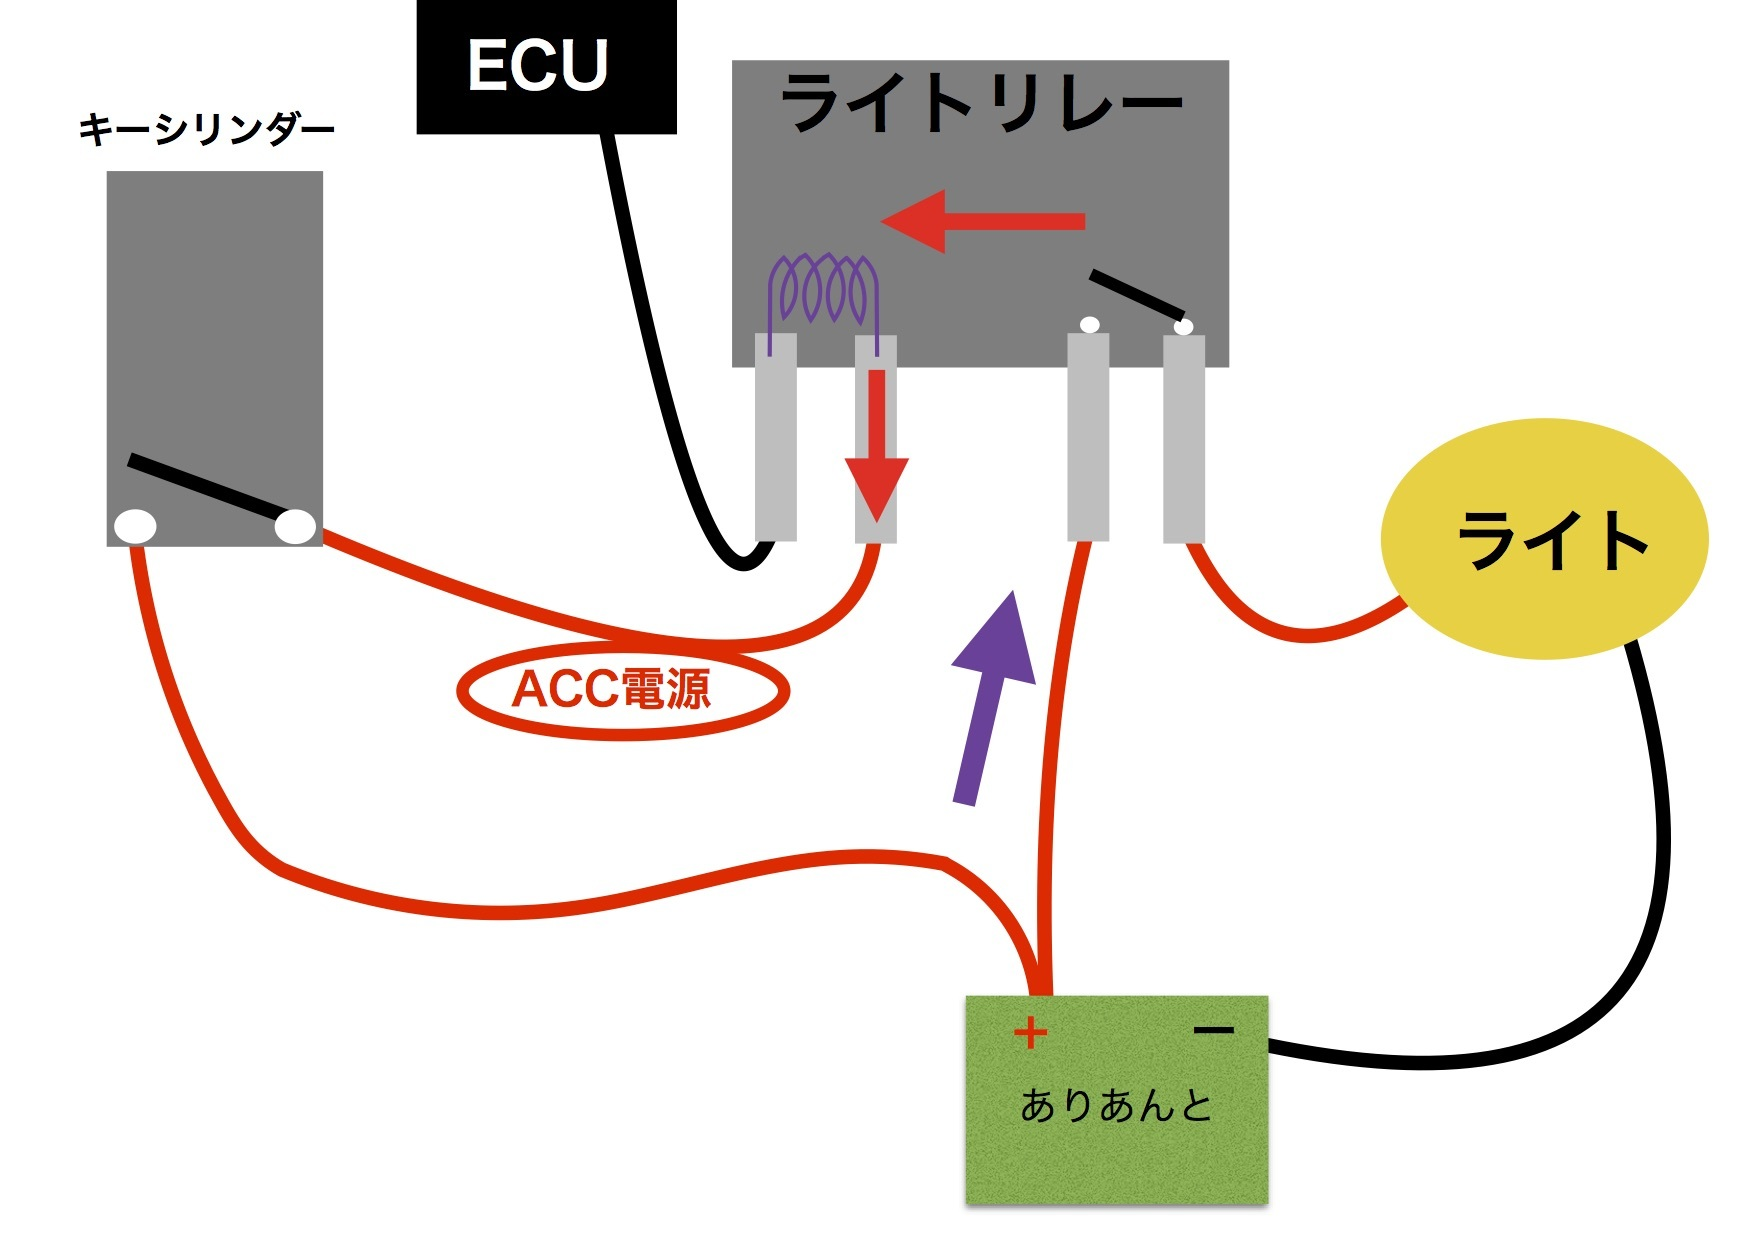 【DB7】サーミスタ回路 ACC電源がアレの件。原因はリレーだ!!_e0159646_05203410.jpg